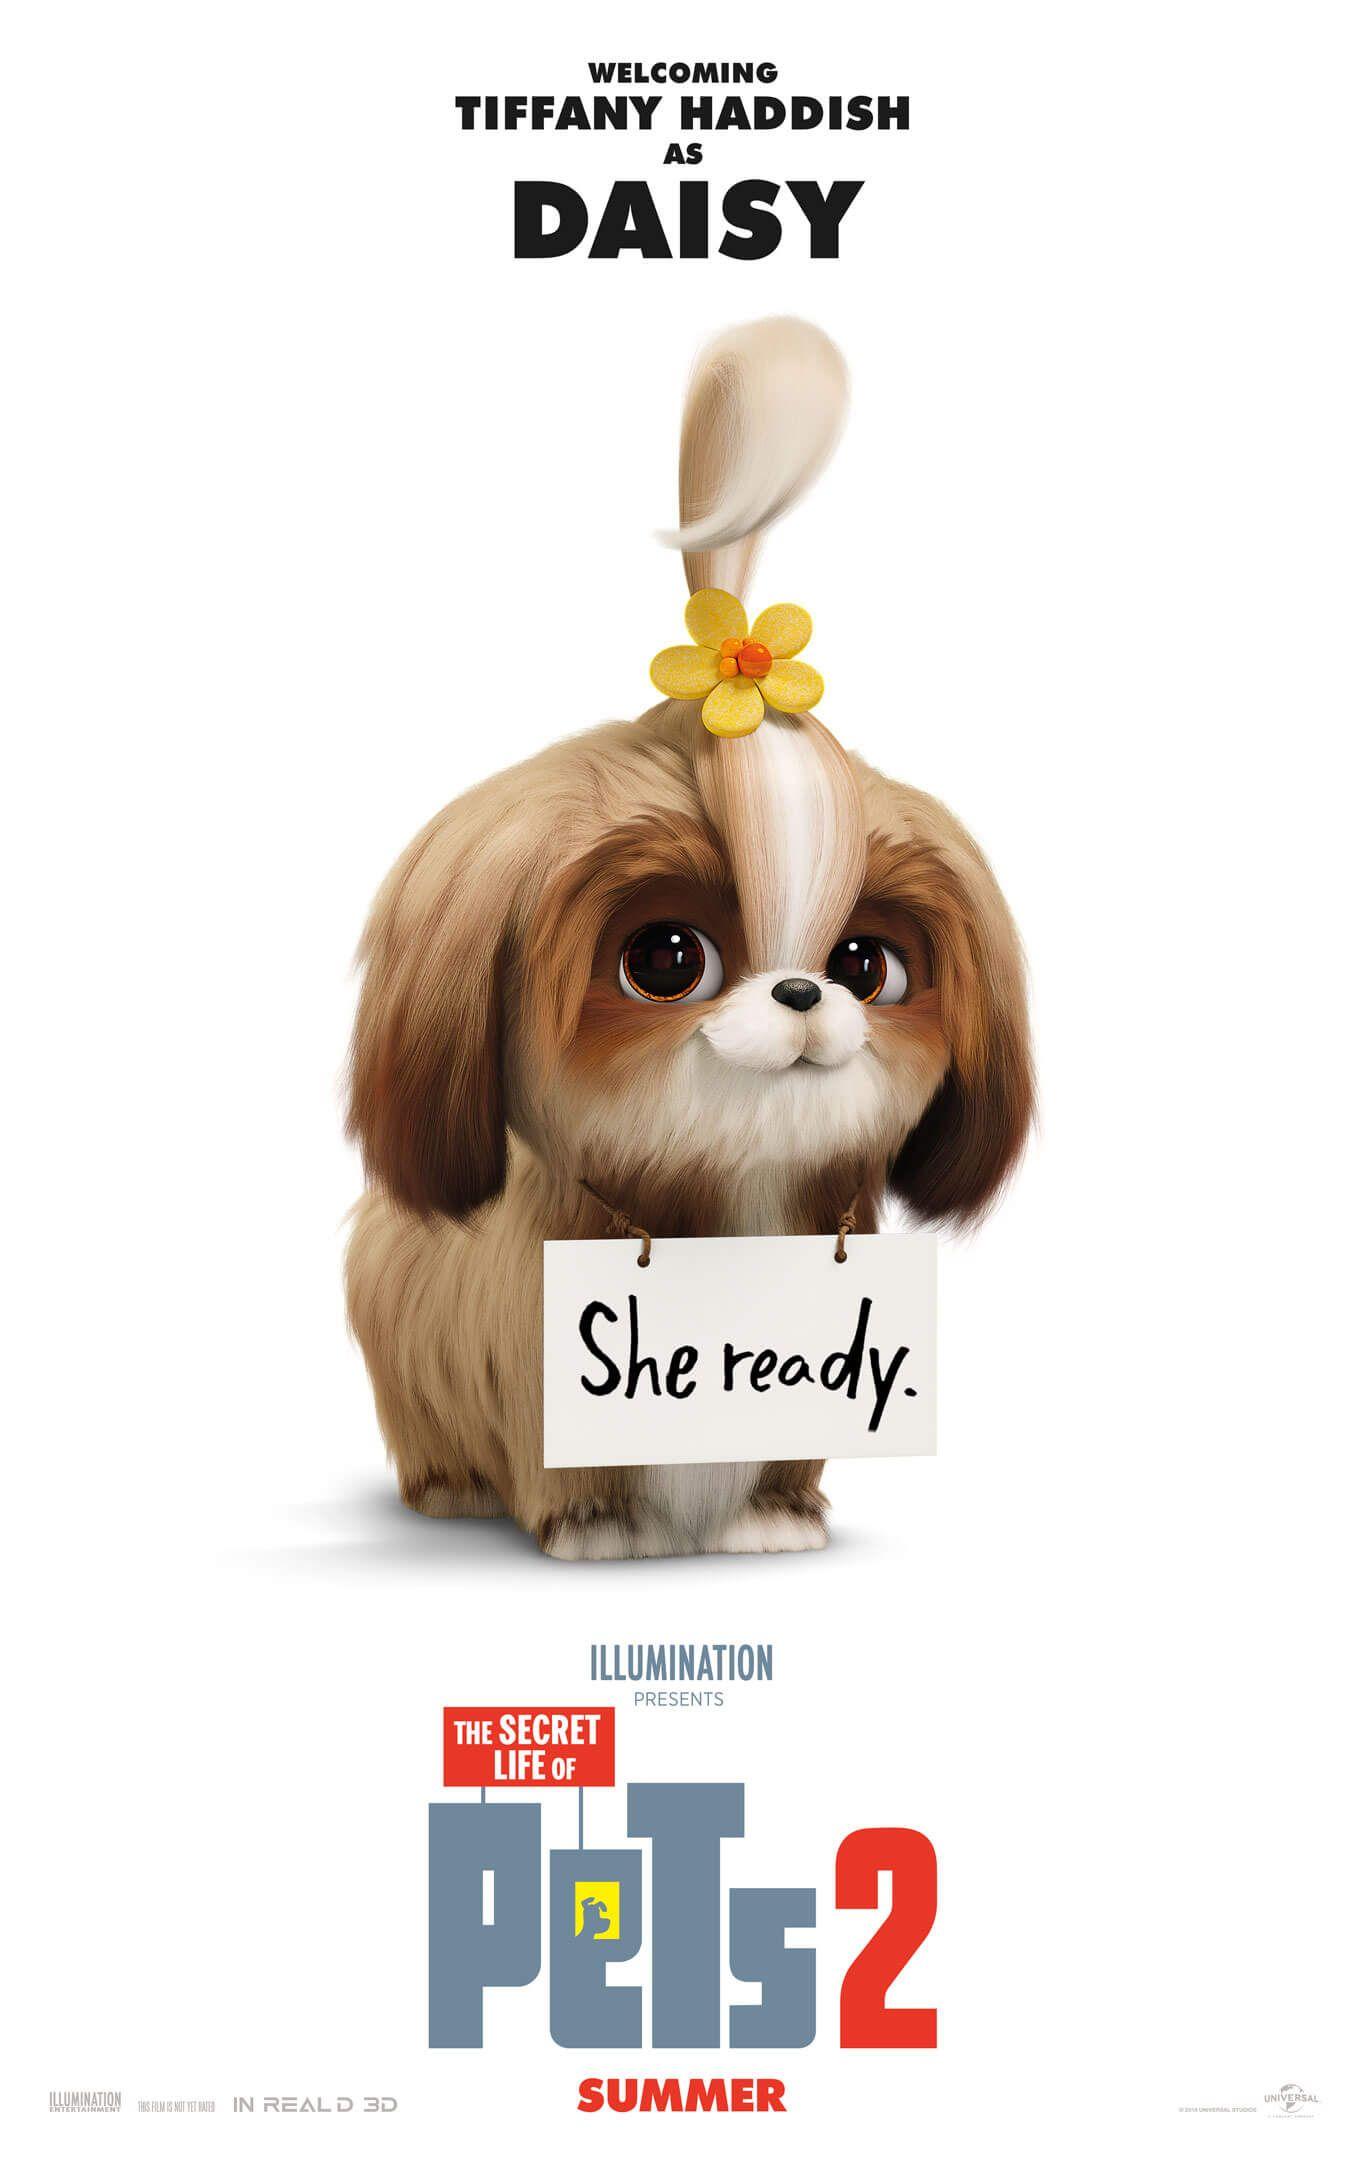 Sinema Evcil Hayvanlarin Gizli Yasami 2 The Secret Life Of Pets 2 Evcil Hayvanlarin Maceralari Devam Ediyor Konusu Ozeti Afisler Evcil Hayvanlar Animasyon Filmler Hayvan